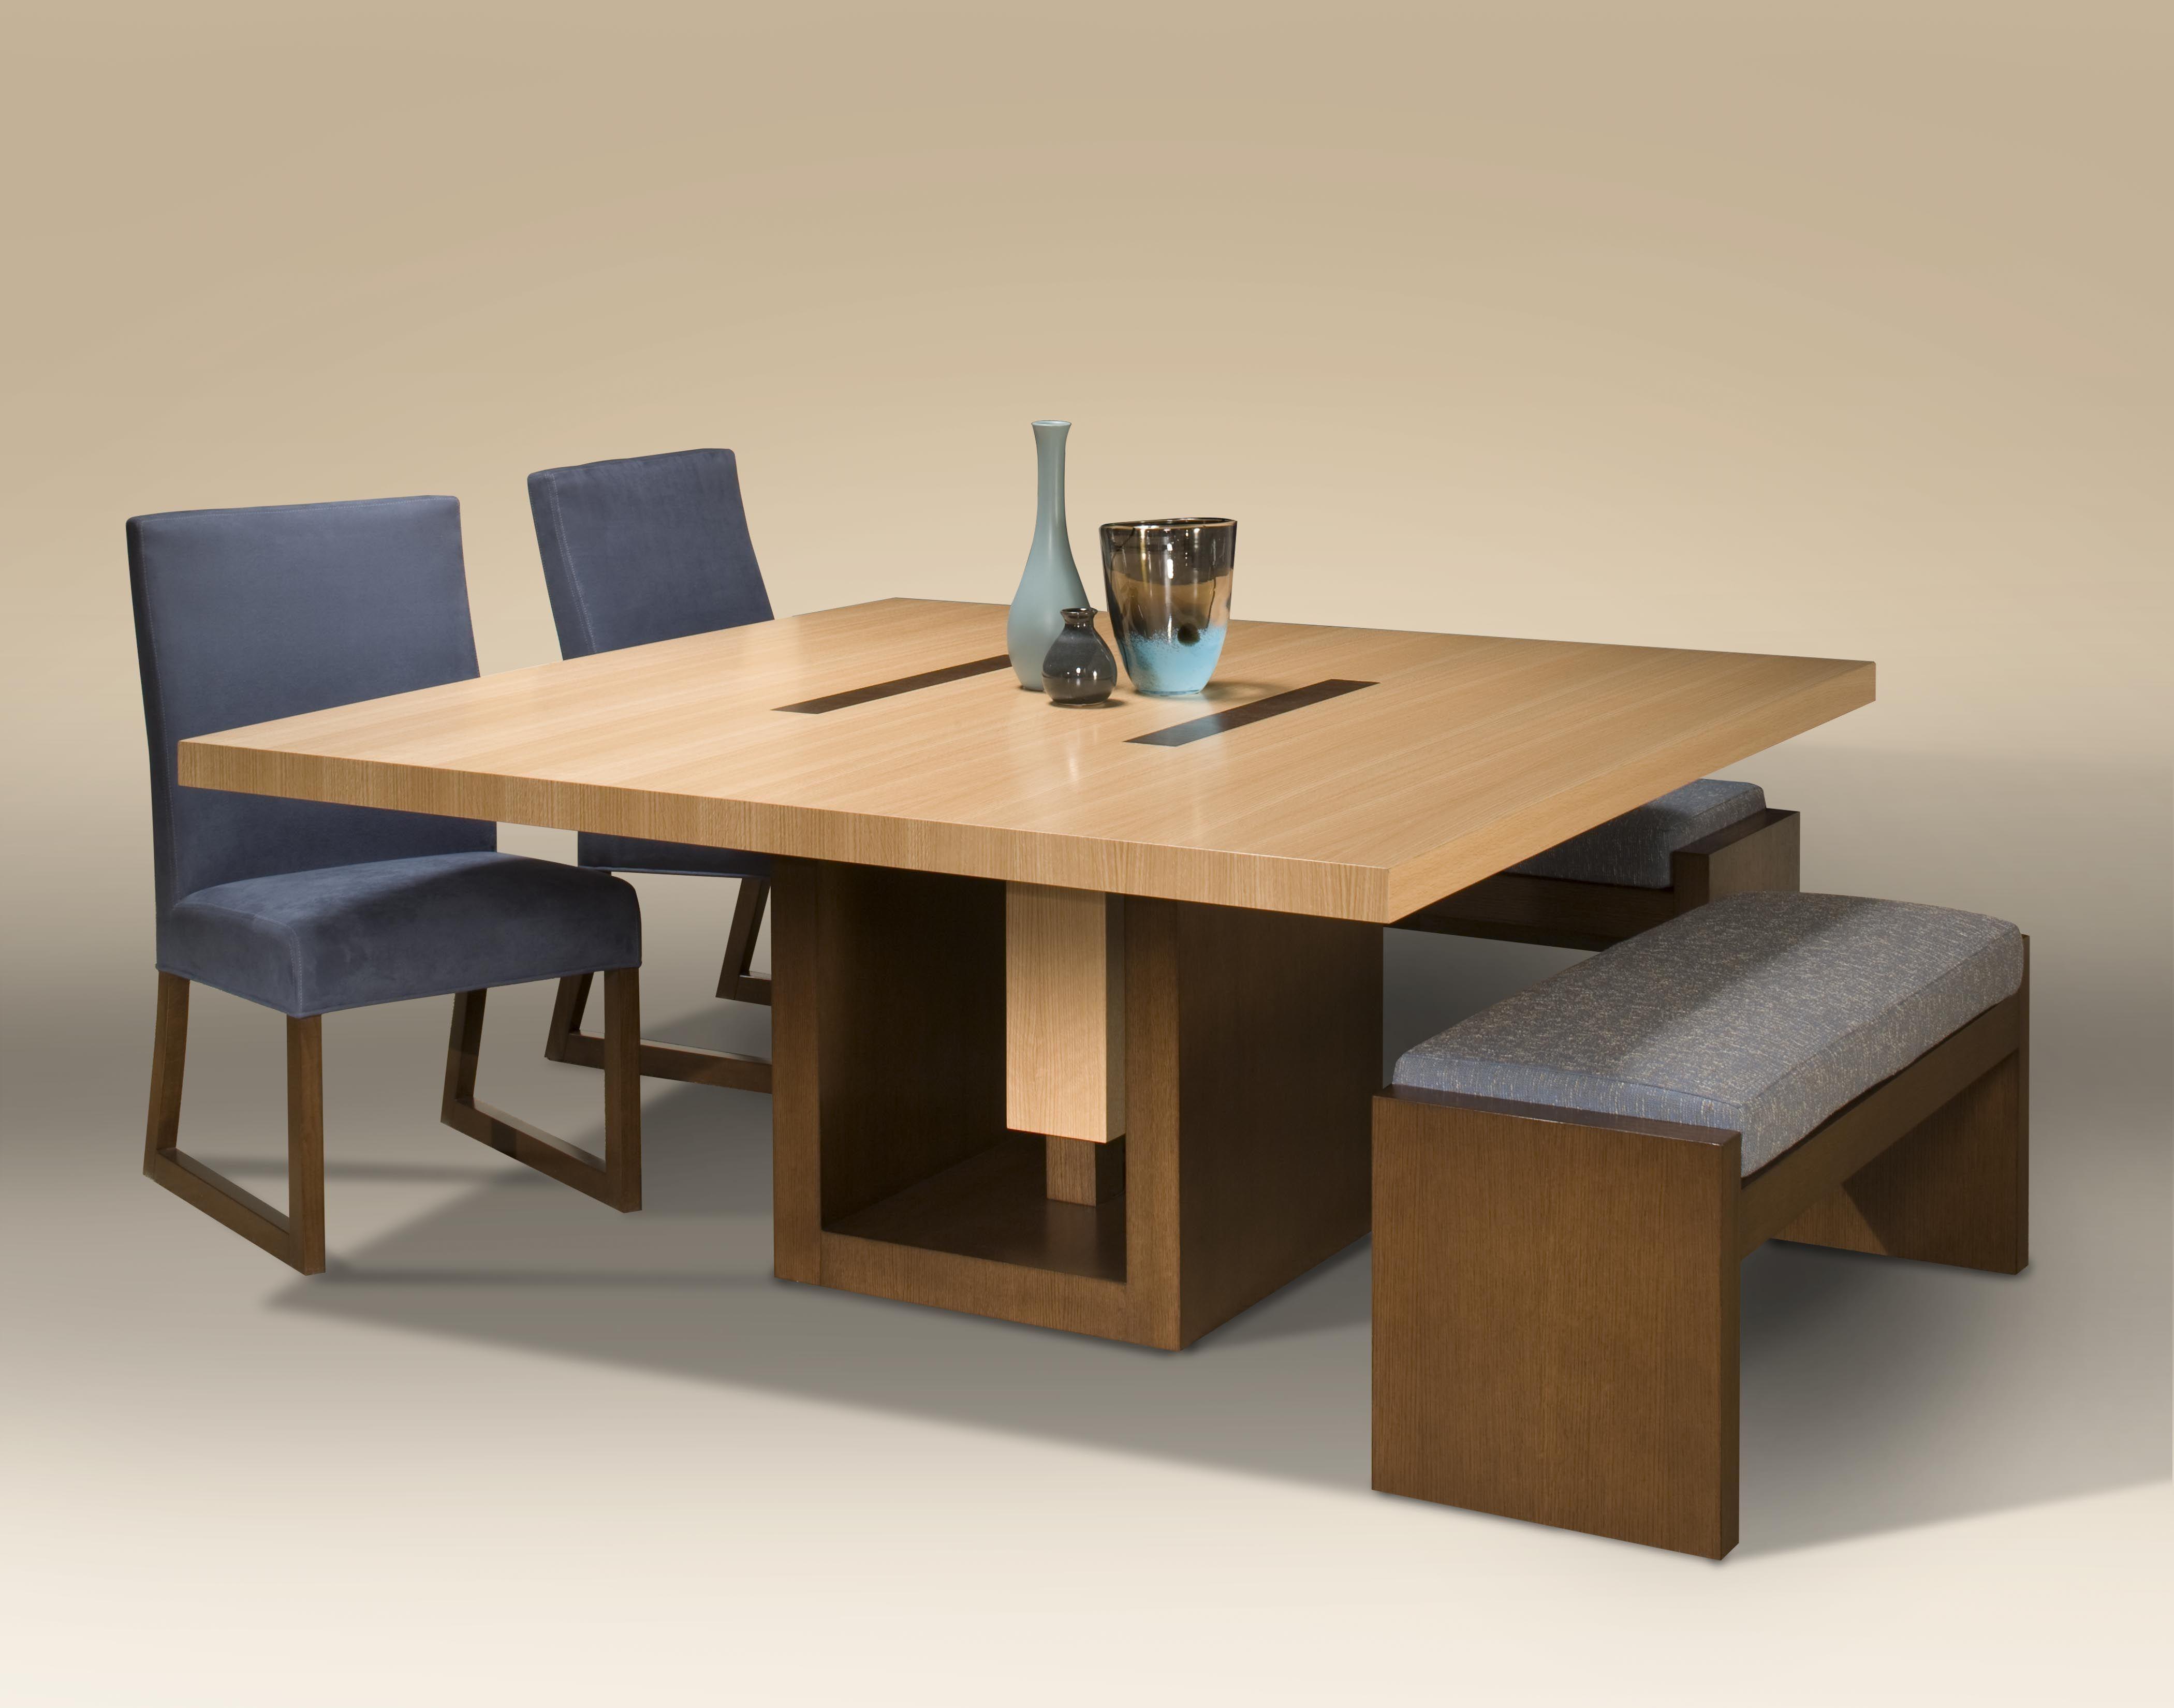 Stockholm Sq Dining Table Interior Design Dining Room Square Dining Room Table Square Dining Tables